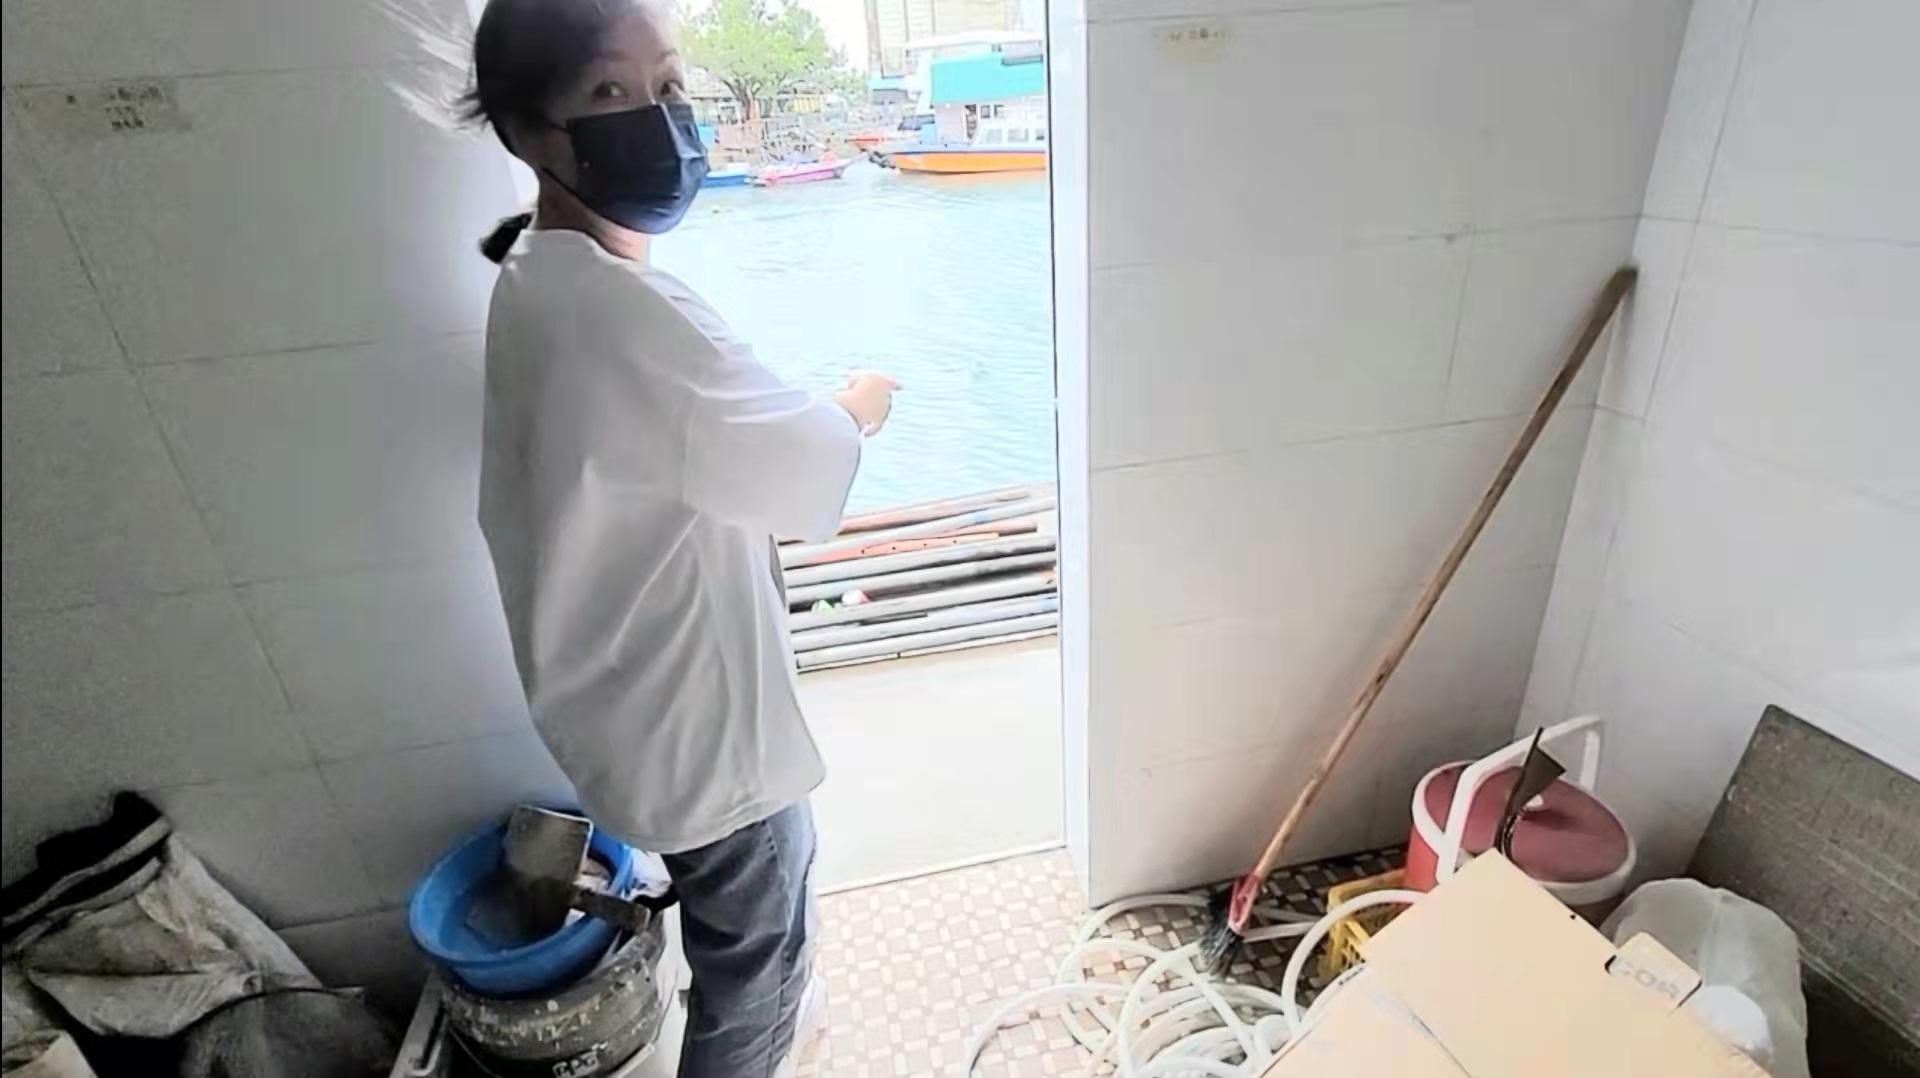 Kate姐憶述上星期的颱風「獅子山」襲港時正遇上天文大潮,海水從後門倒罐,淹浸了半個鋪面,海帶來的沙泥如今還可清楚看見。